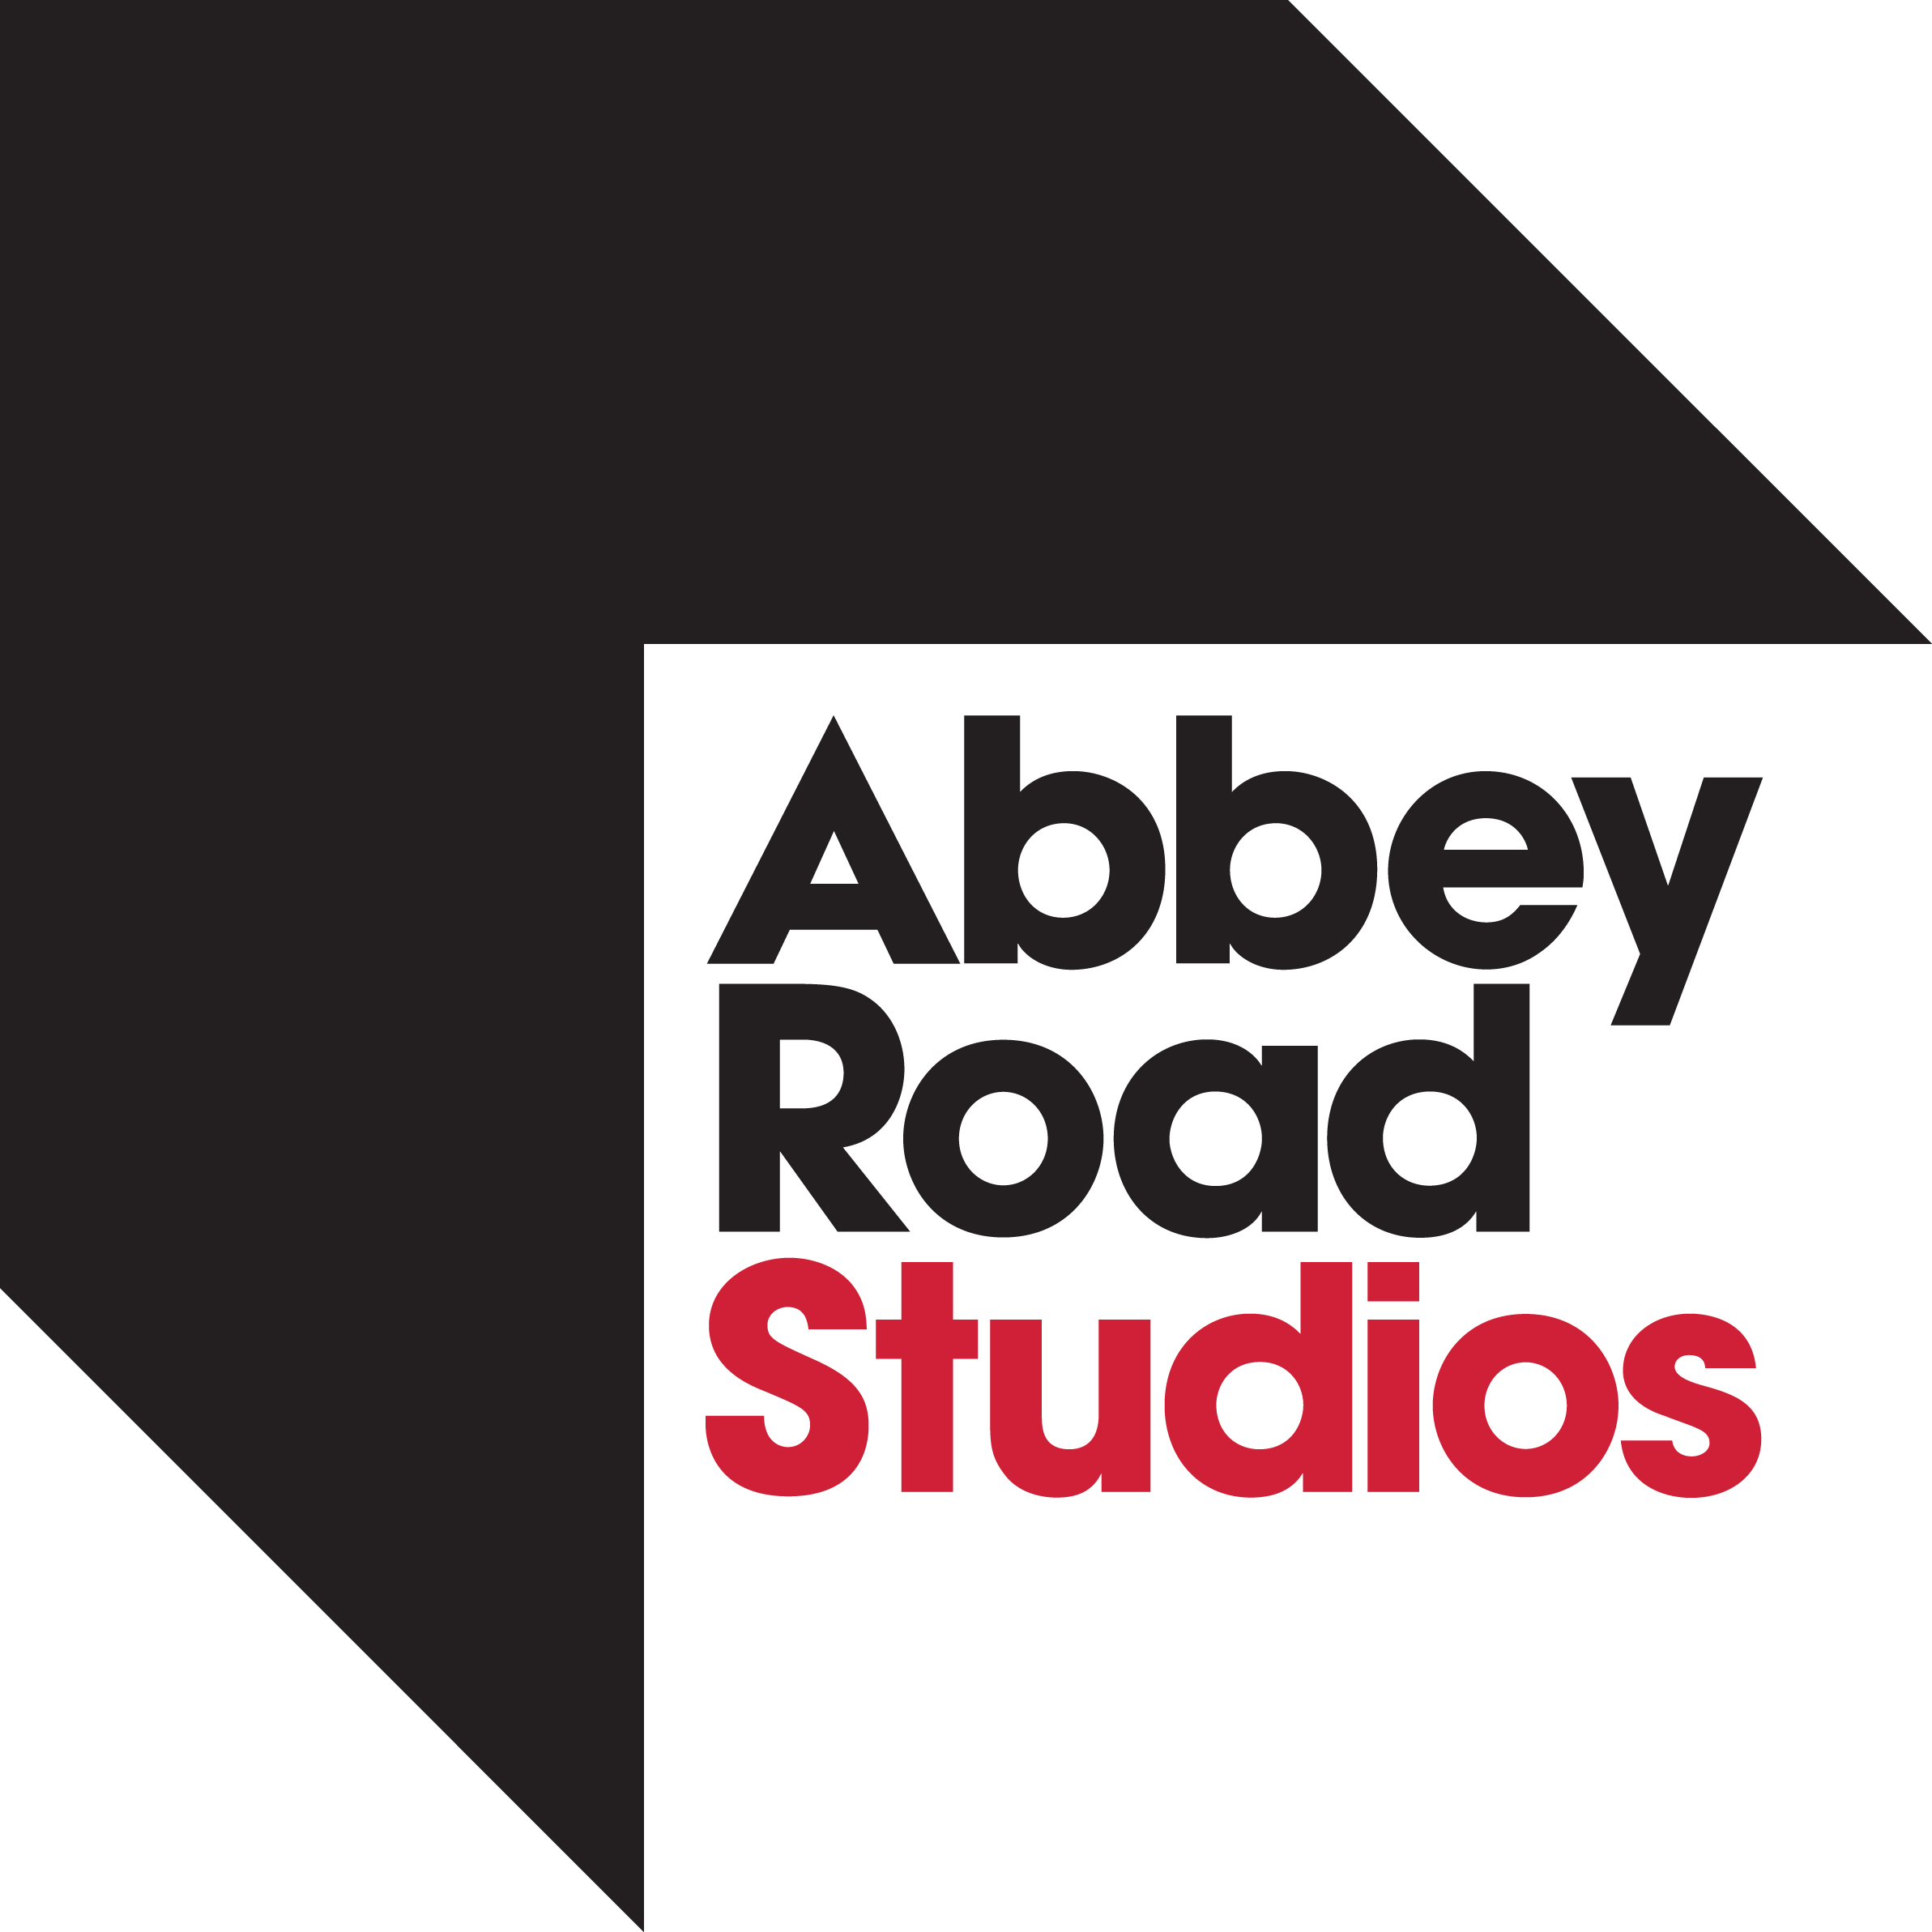 AbbeyRoadStudios